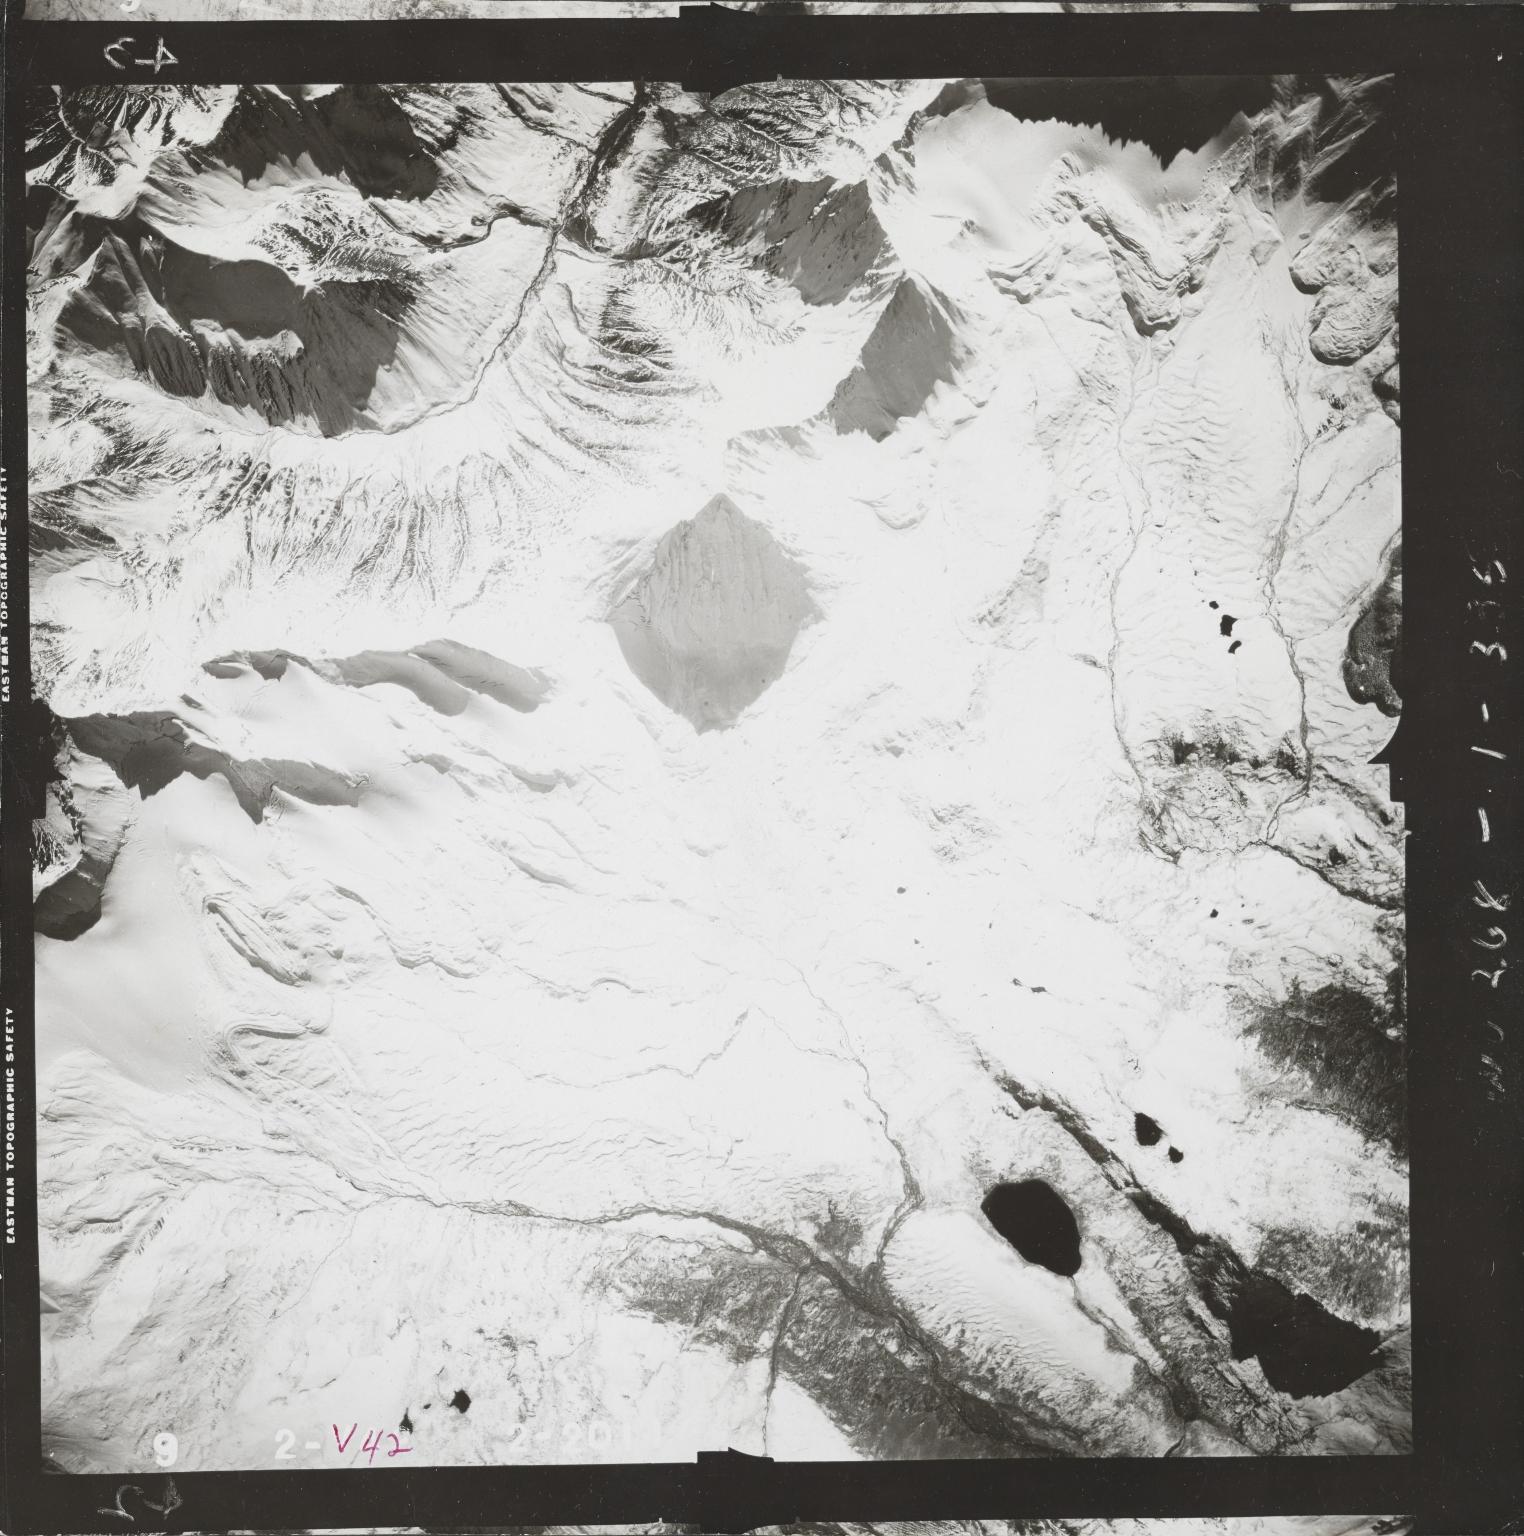 Mount Hayes, aerial photograph FL 80 V-42, Alaska